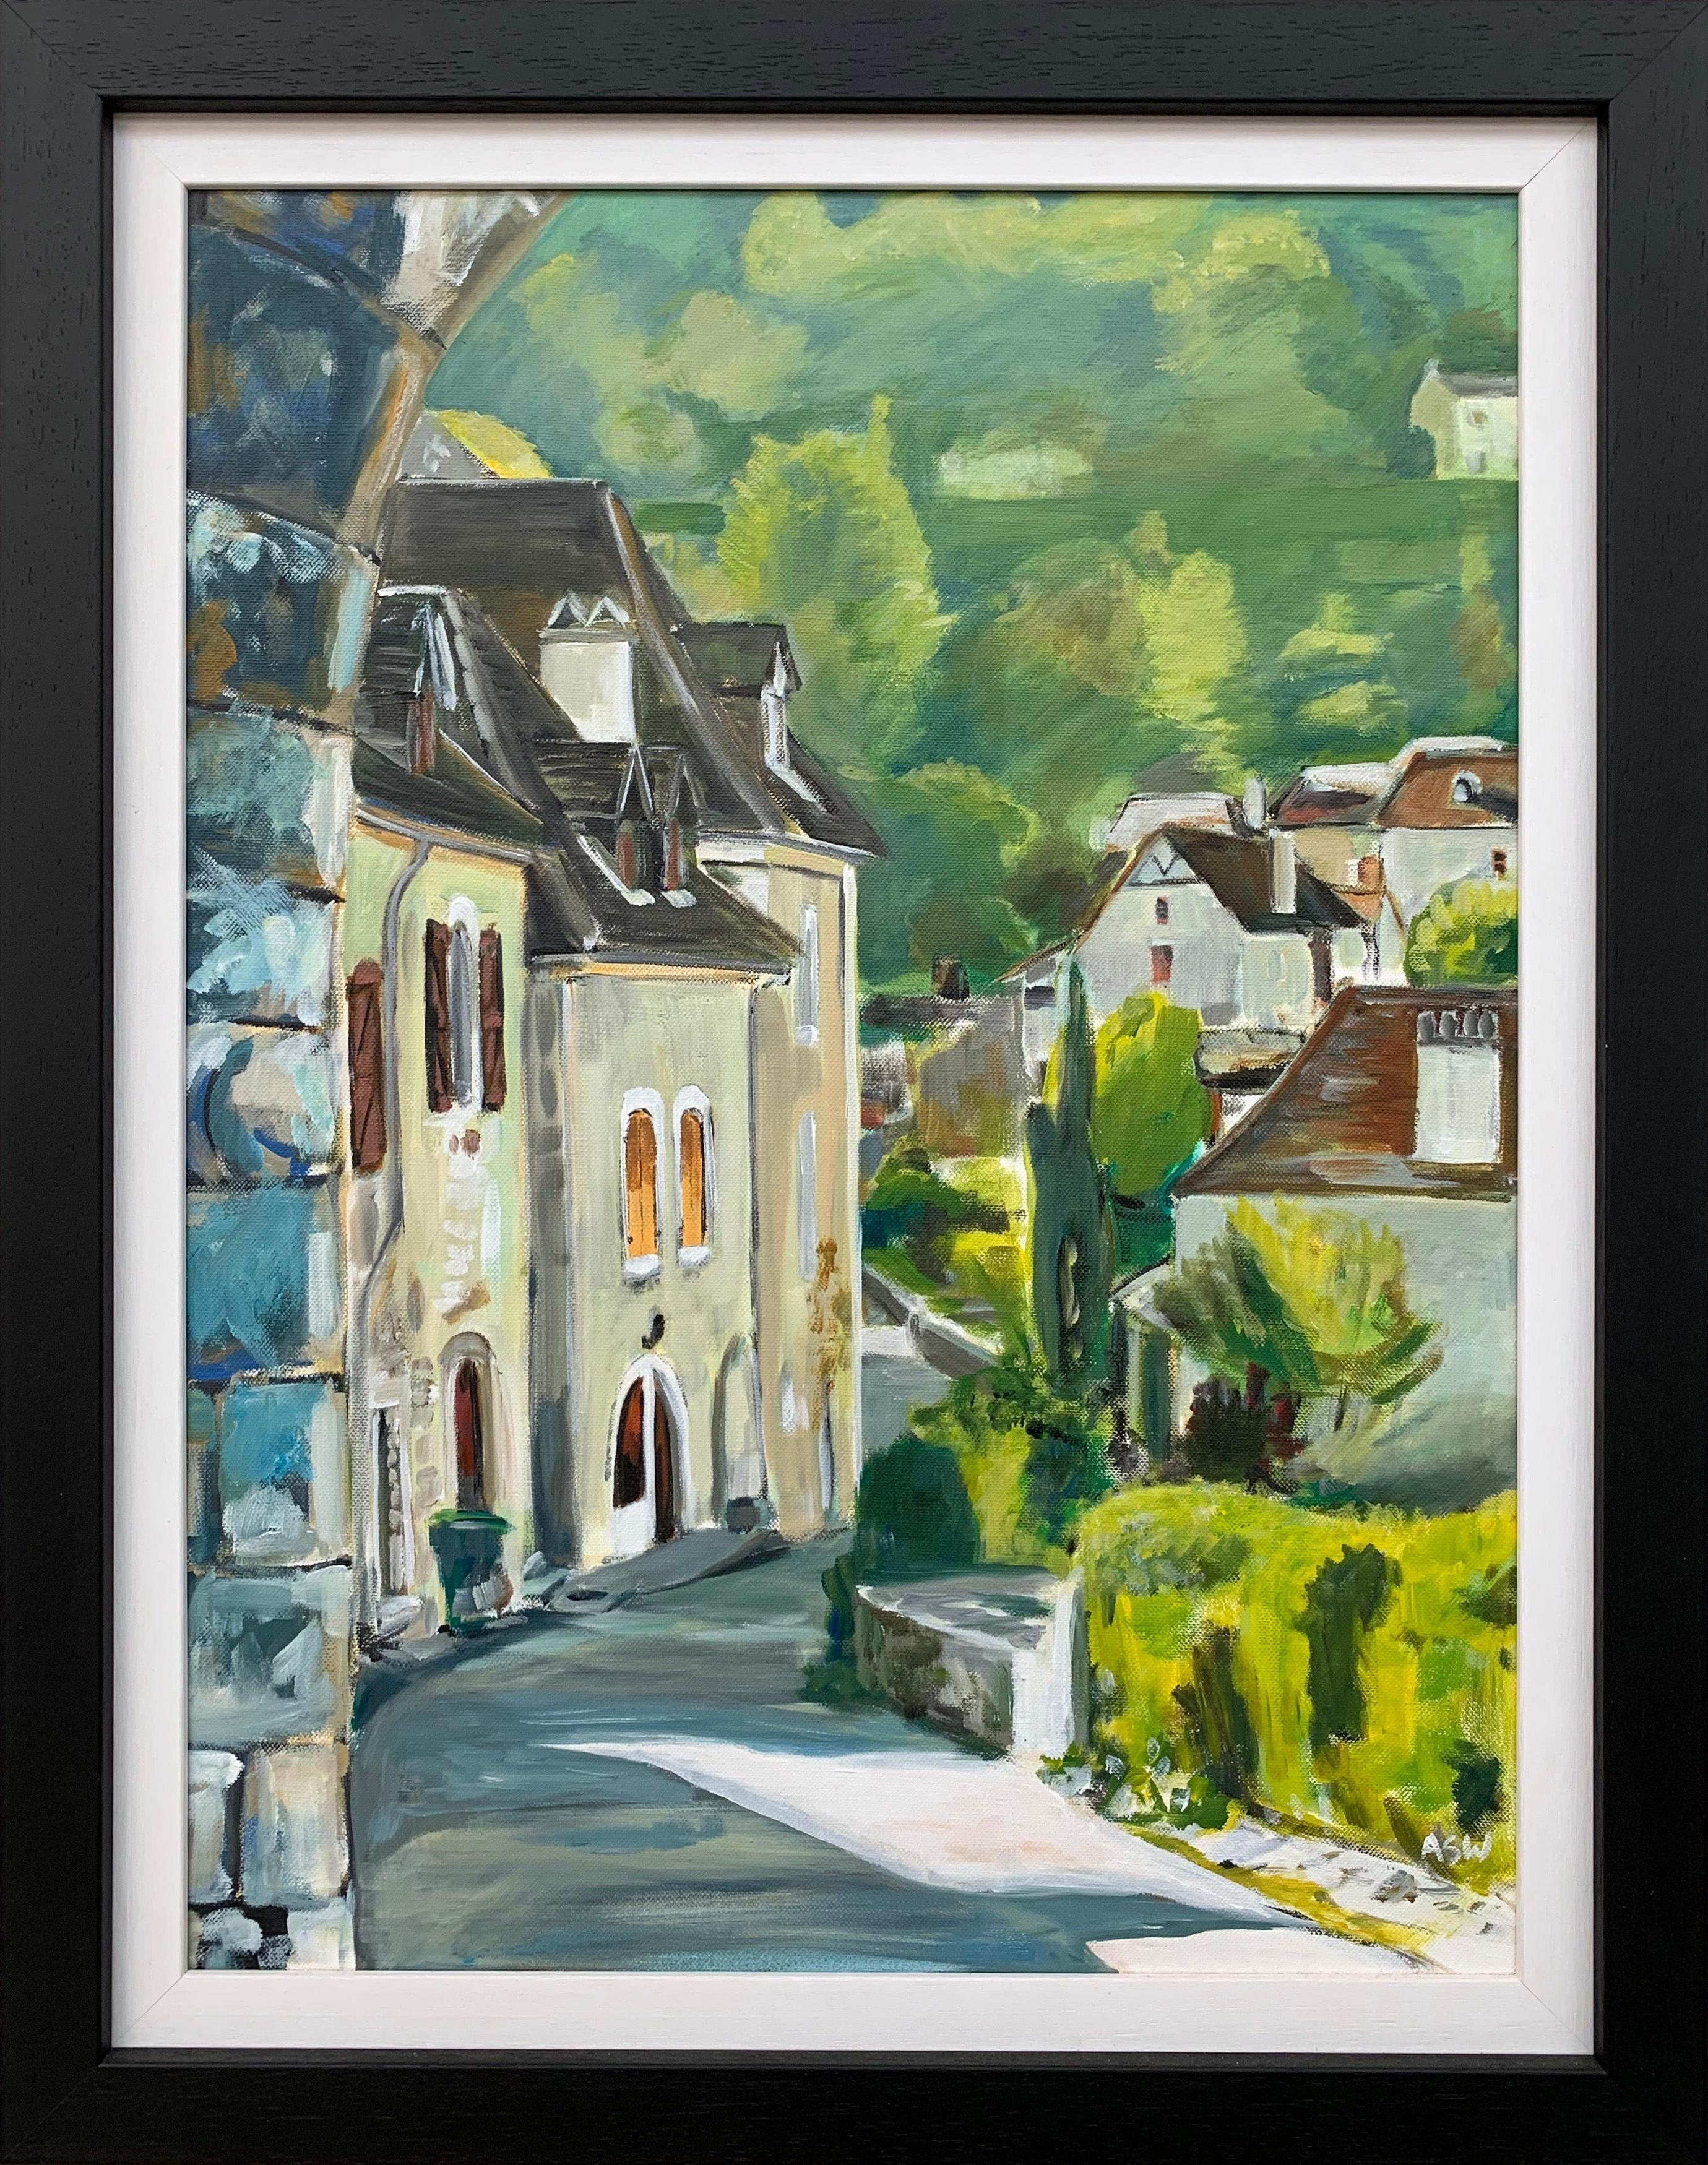 Painting of Medieval French Village Saint Cirq Lapopie by Modern British Artist